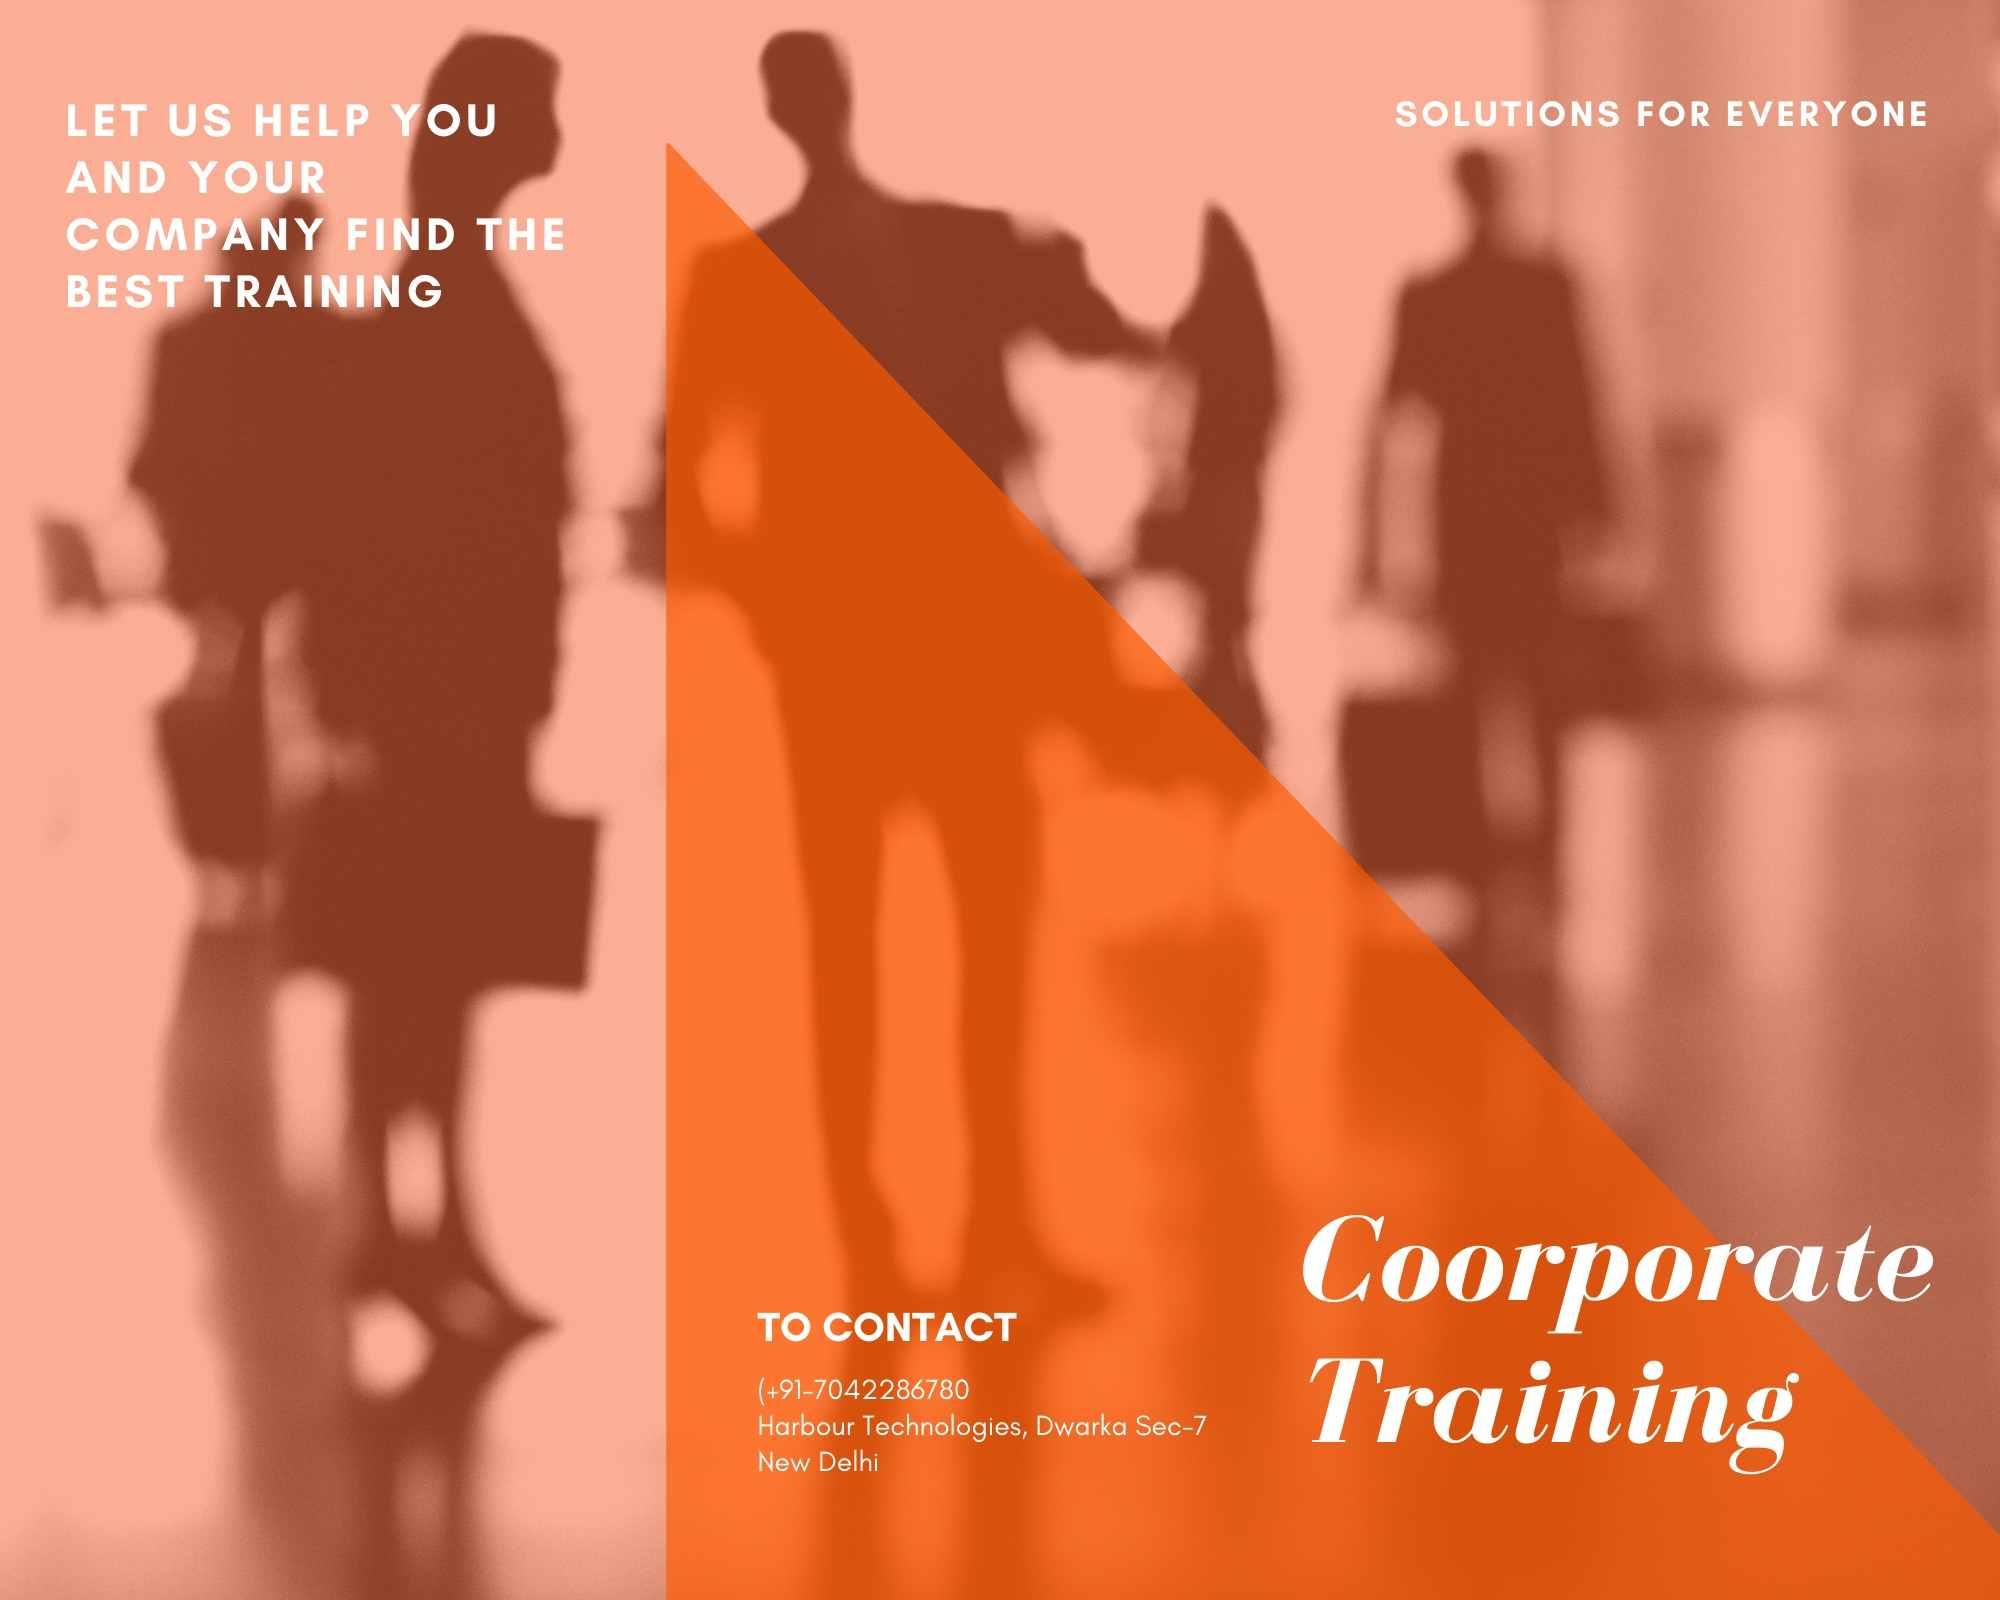 coorporate training